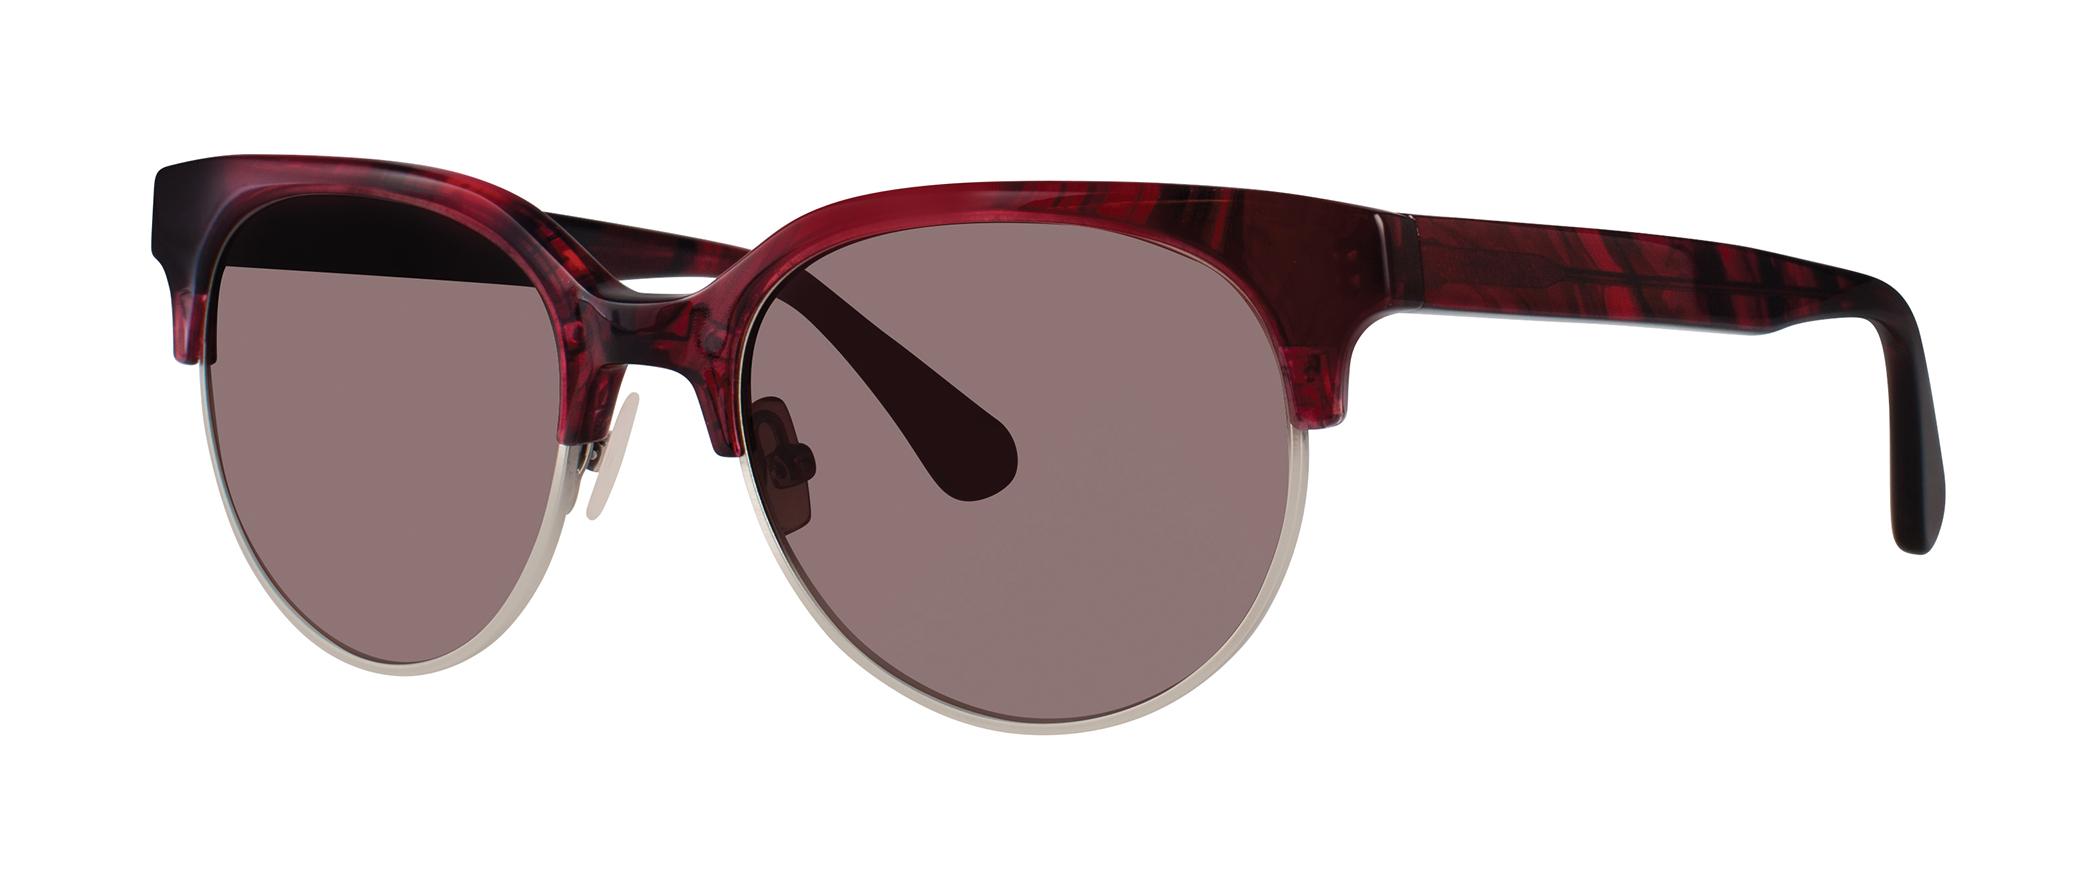 Kenmark Eyewear renews licence agreement for Vera Wang